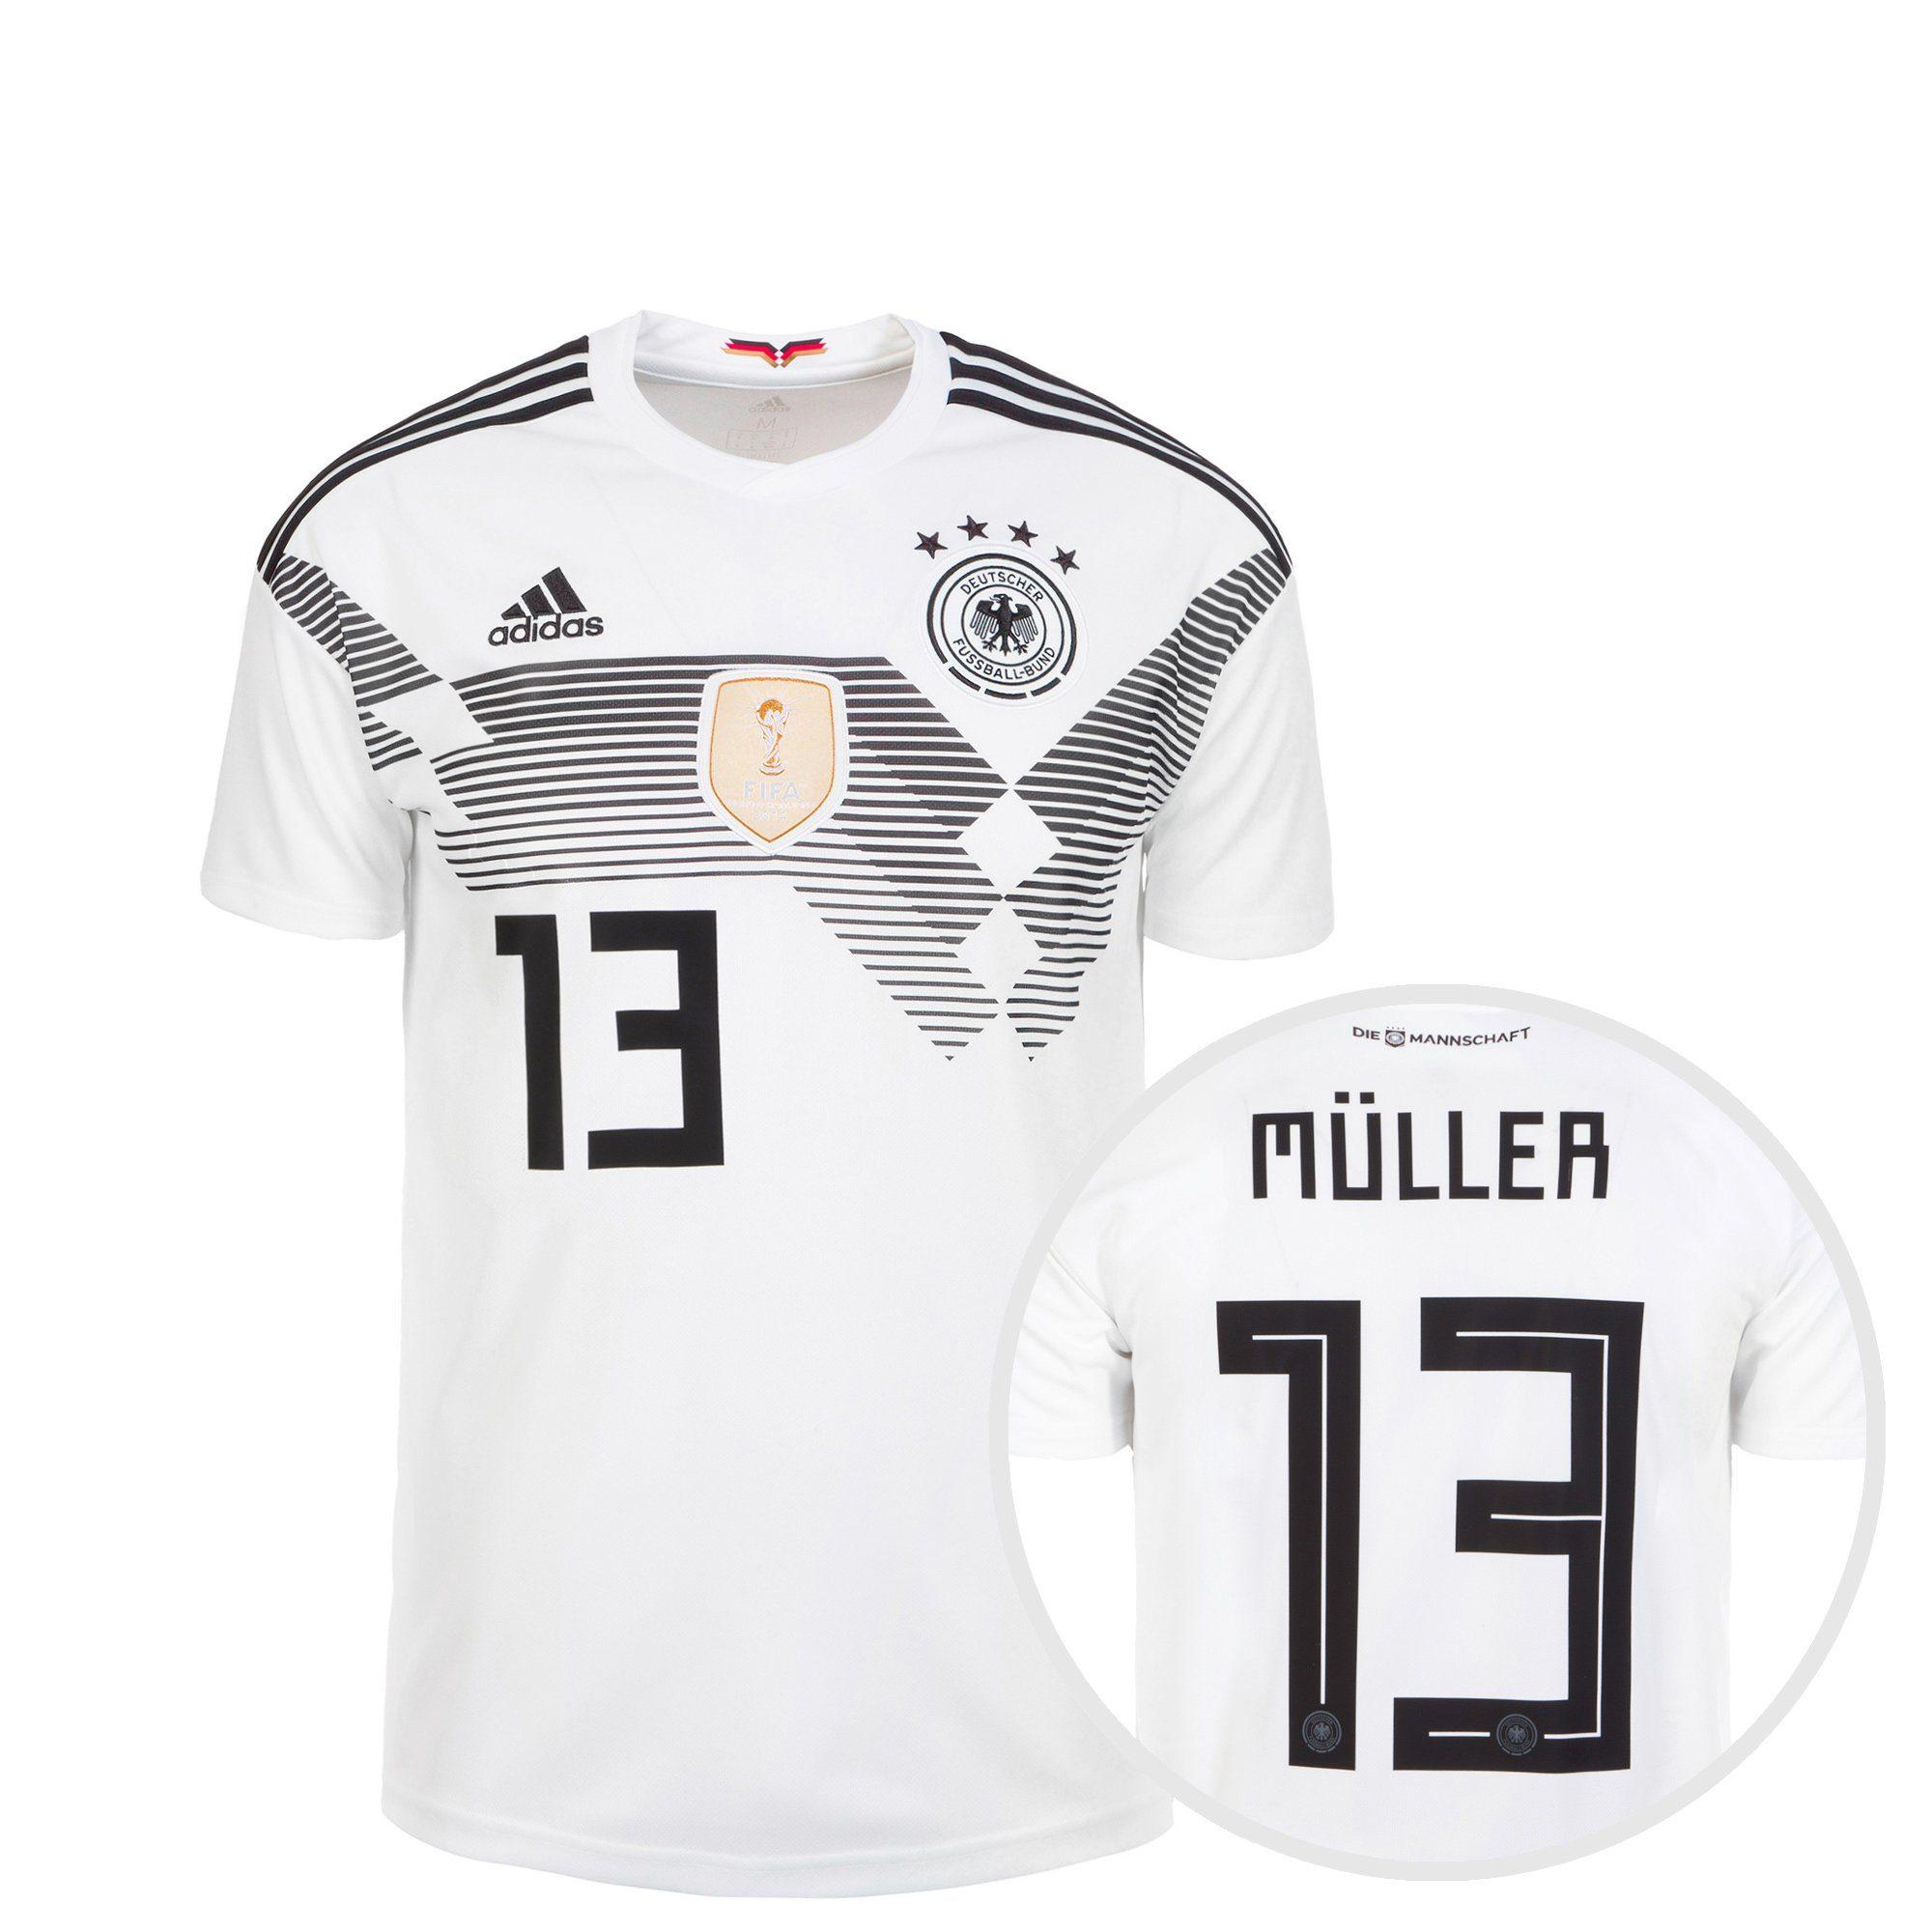 adidas Performance Fußballtrikot Dfb Trikot Müller Wm 2018 Heim Preisvergleich